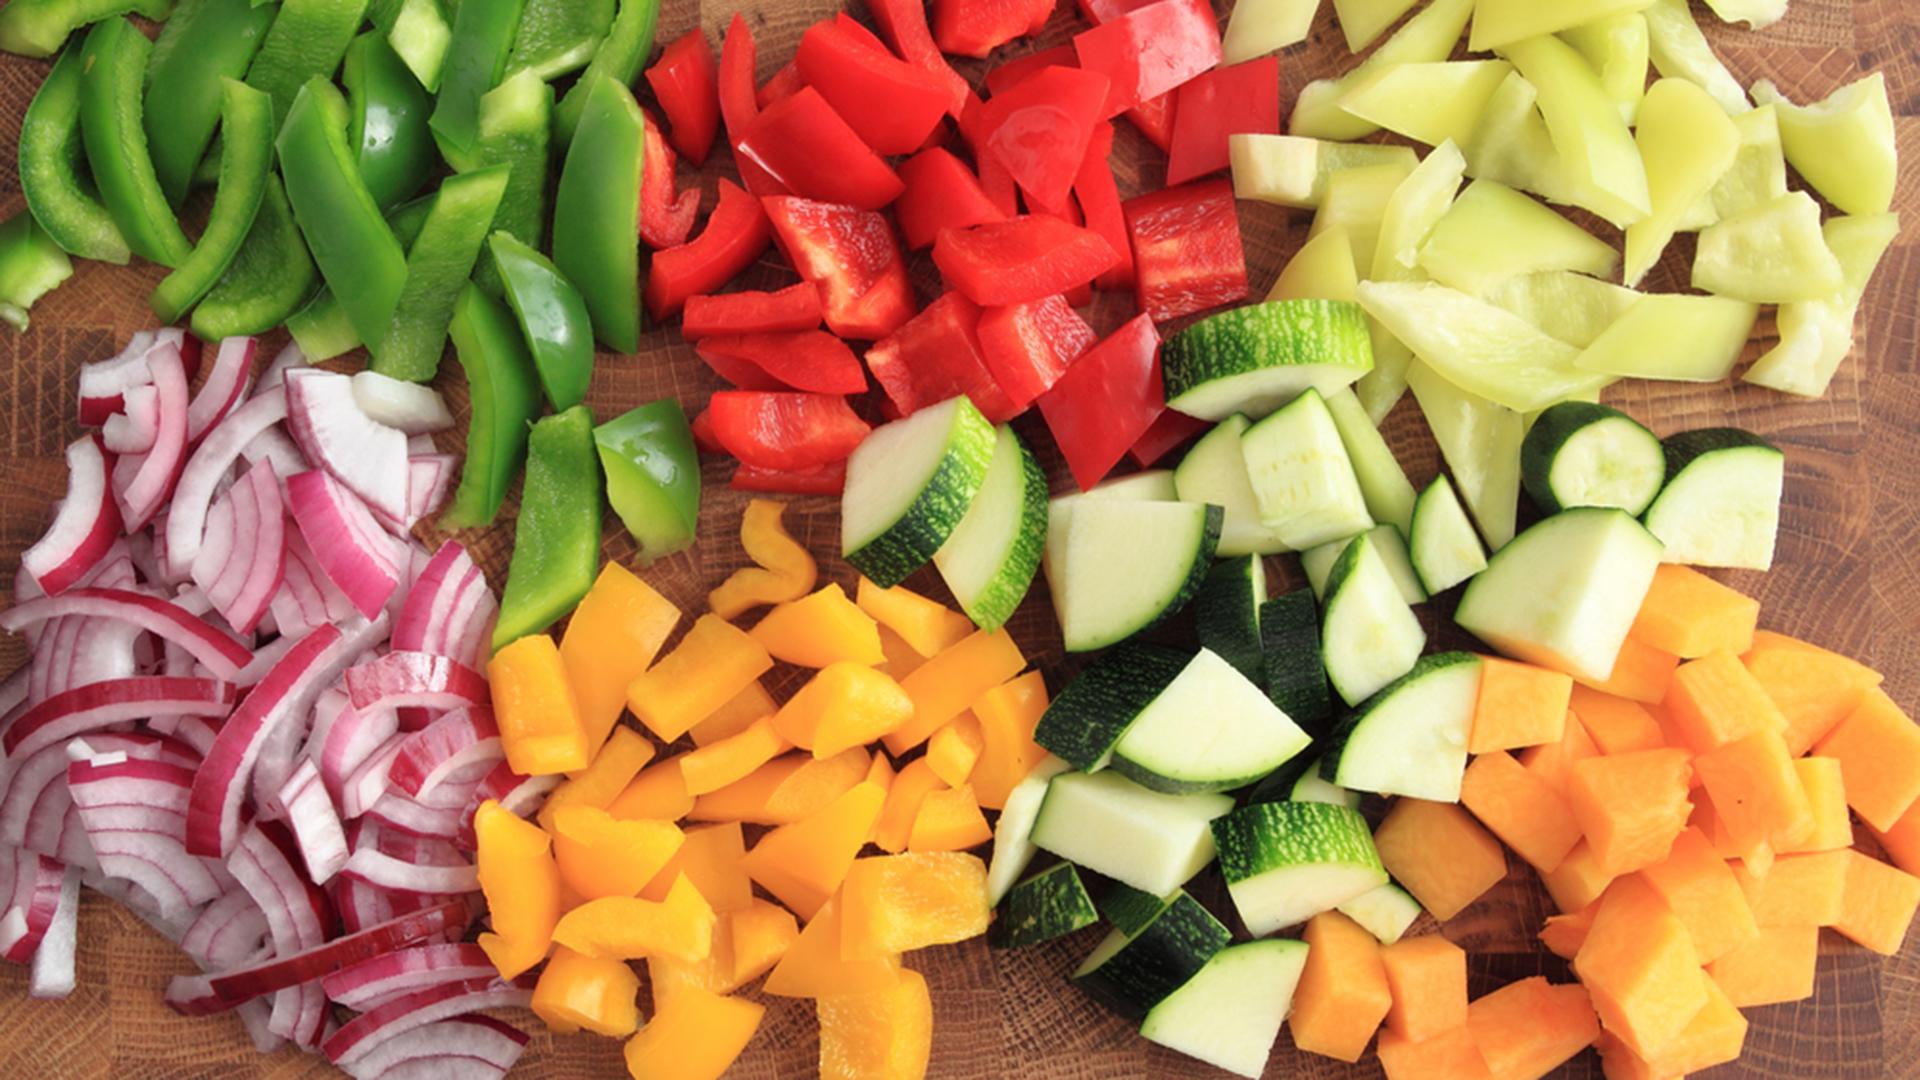 Food Processor For Chopping Veggies